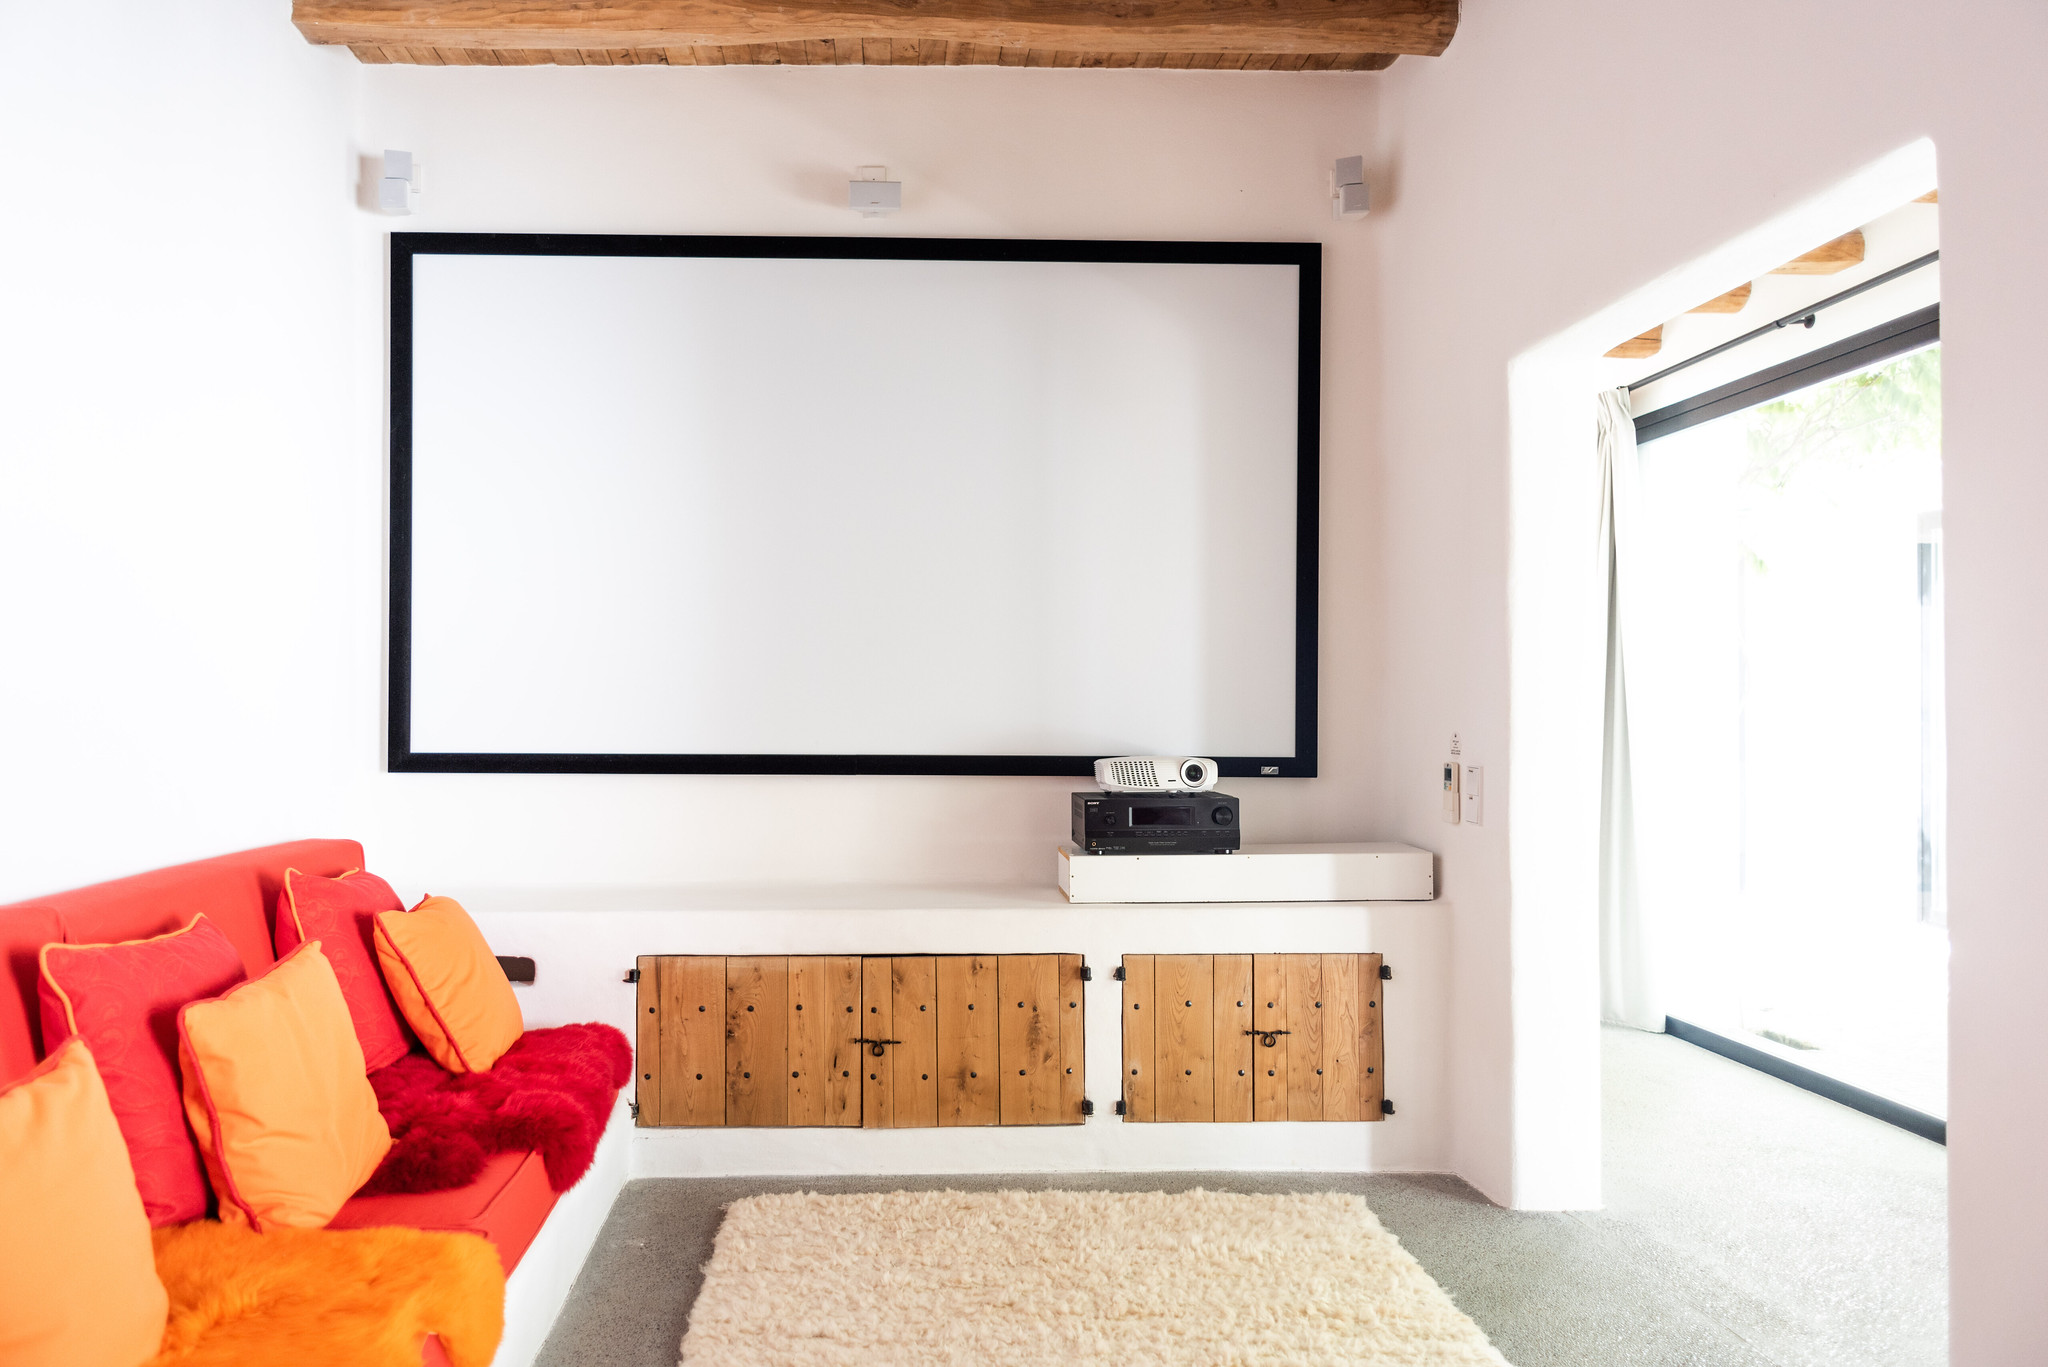 https://www.white-ibiza.com/wp-content/uploads/2020/05/white-ibiza-villas-can-terra-cinema-room.jpg